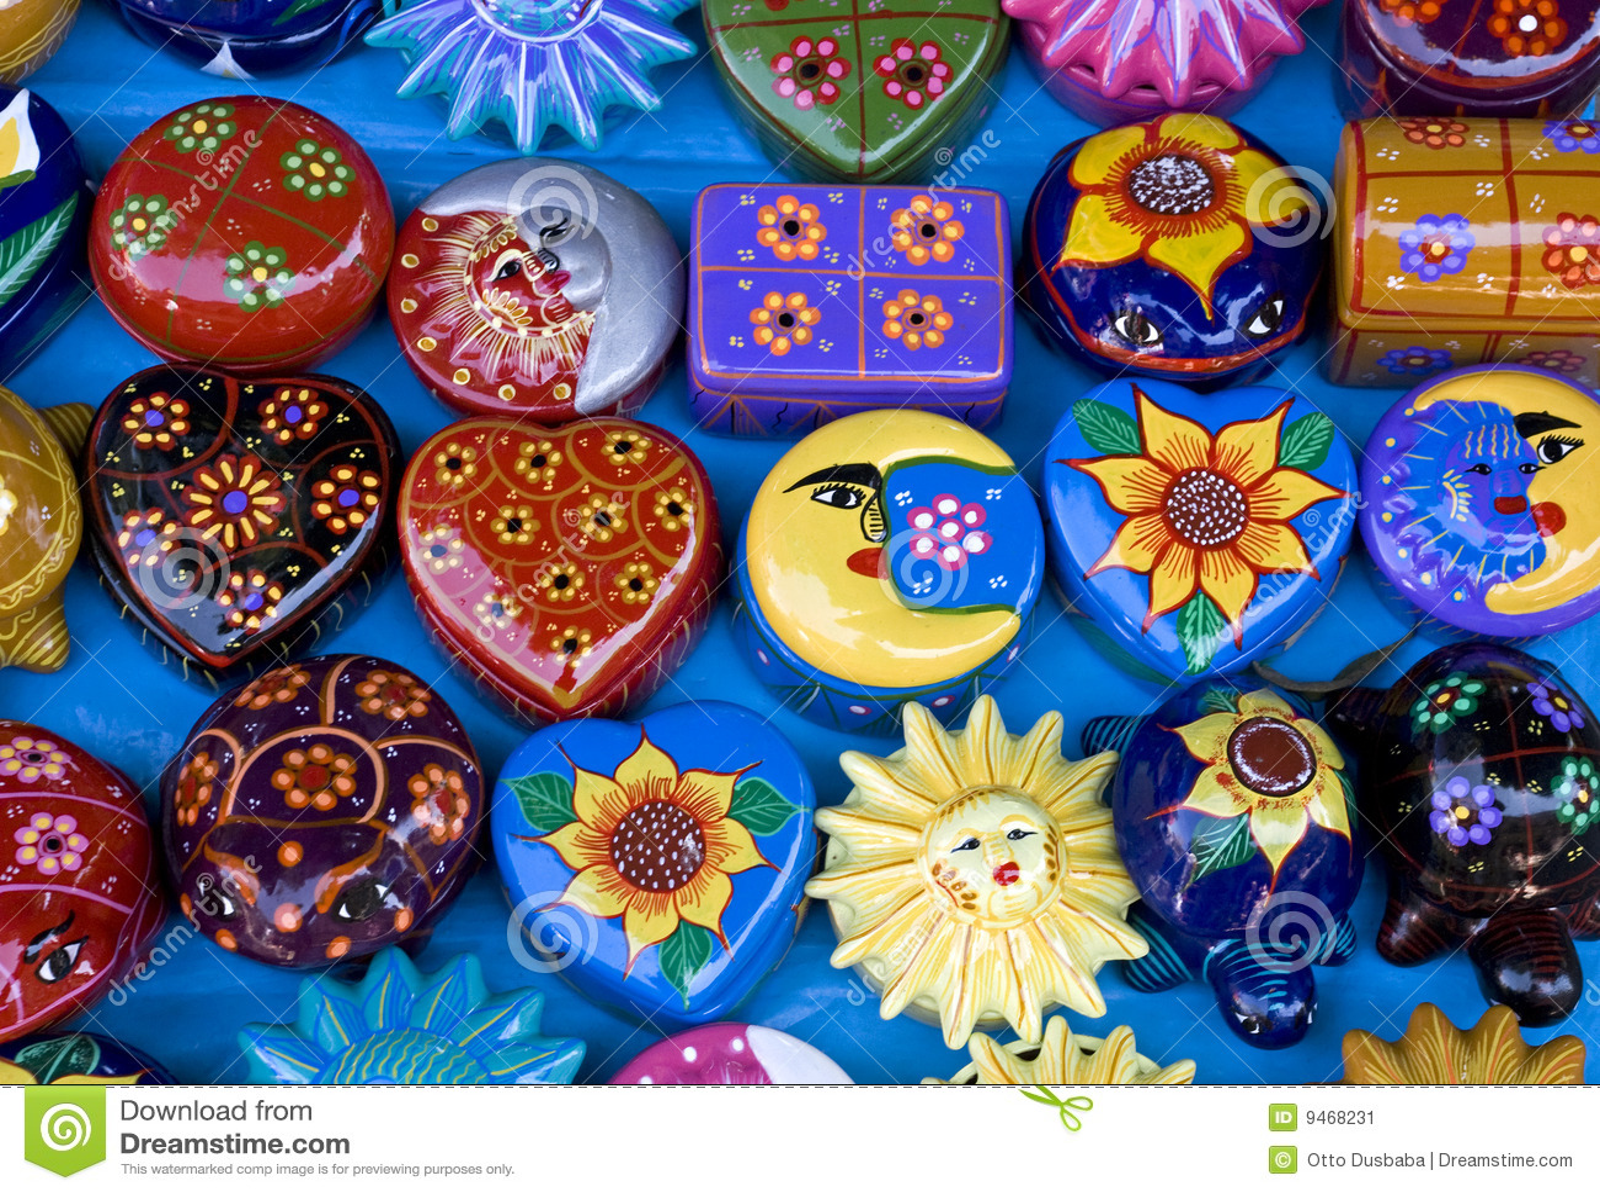 Plate Art Ceramic